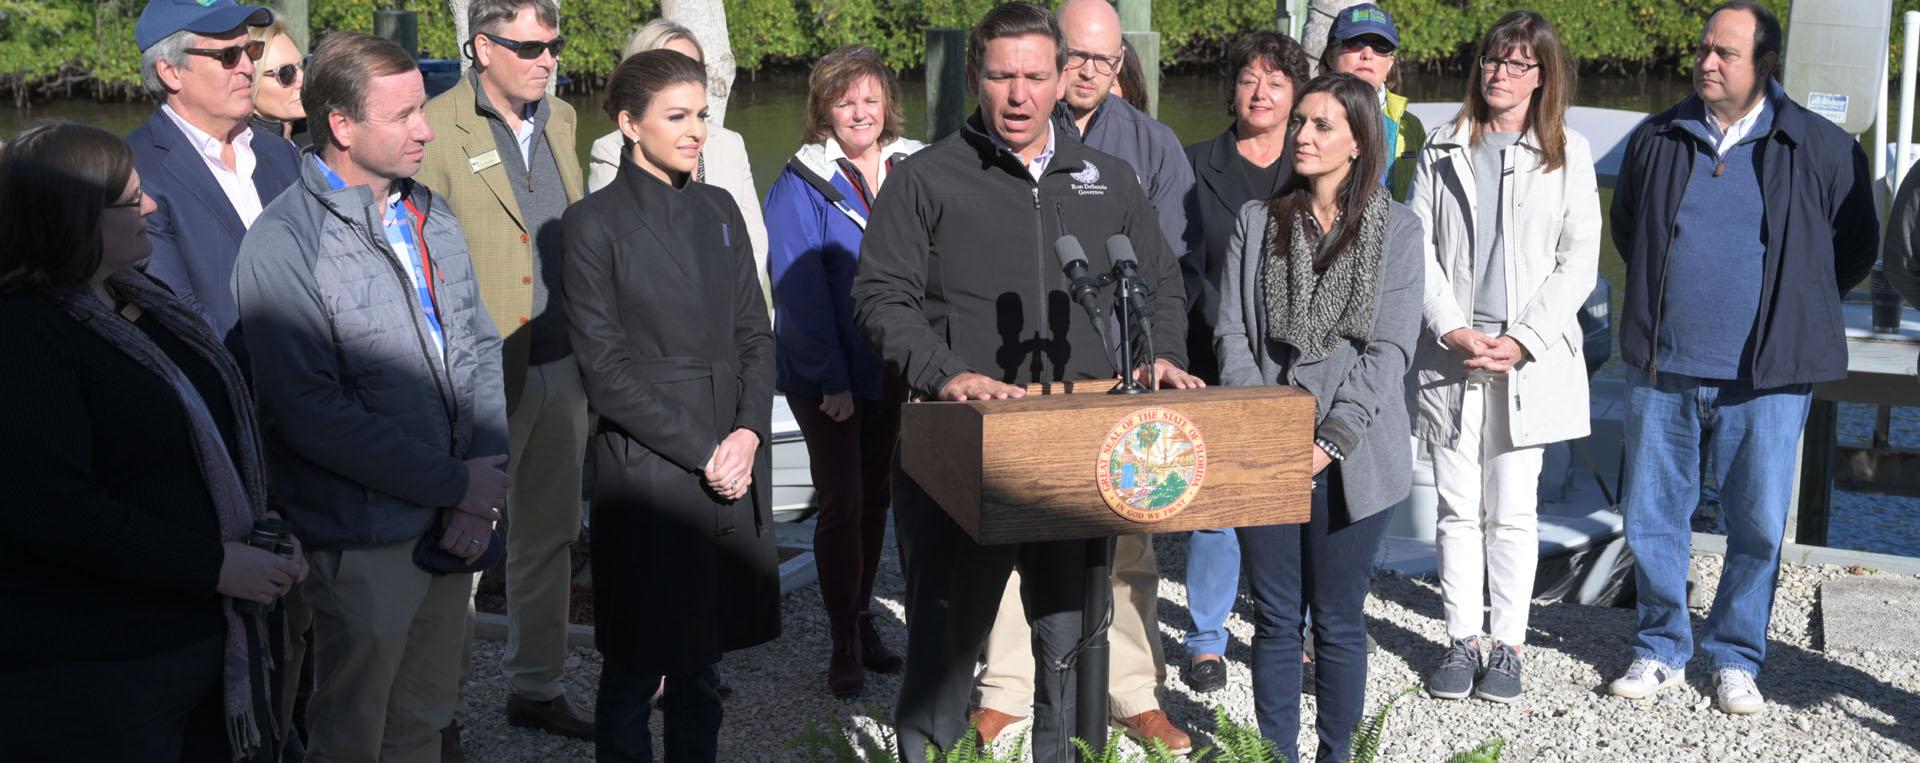 Ron DeSantis - Protecting Florida Together Speech